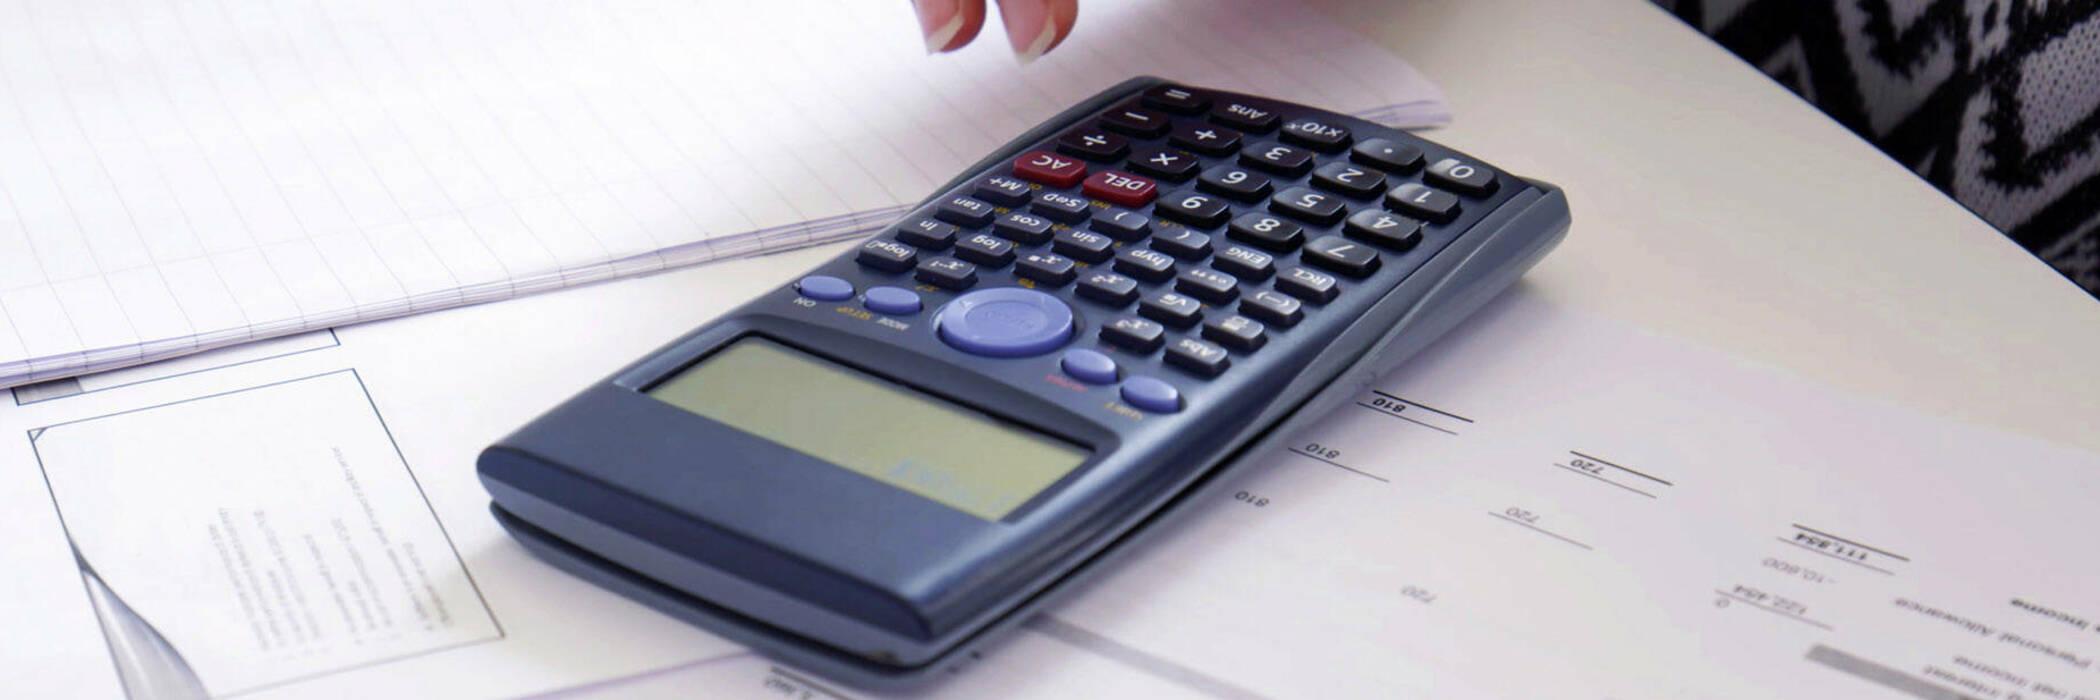 Scientific calculator on paperwork